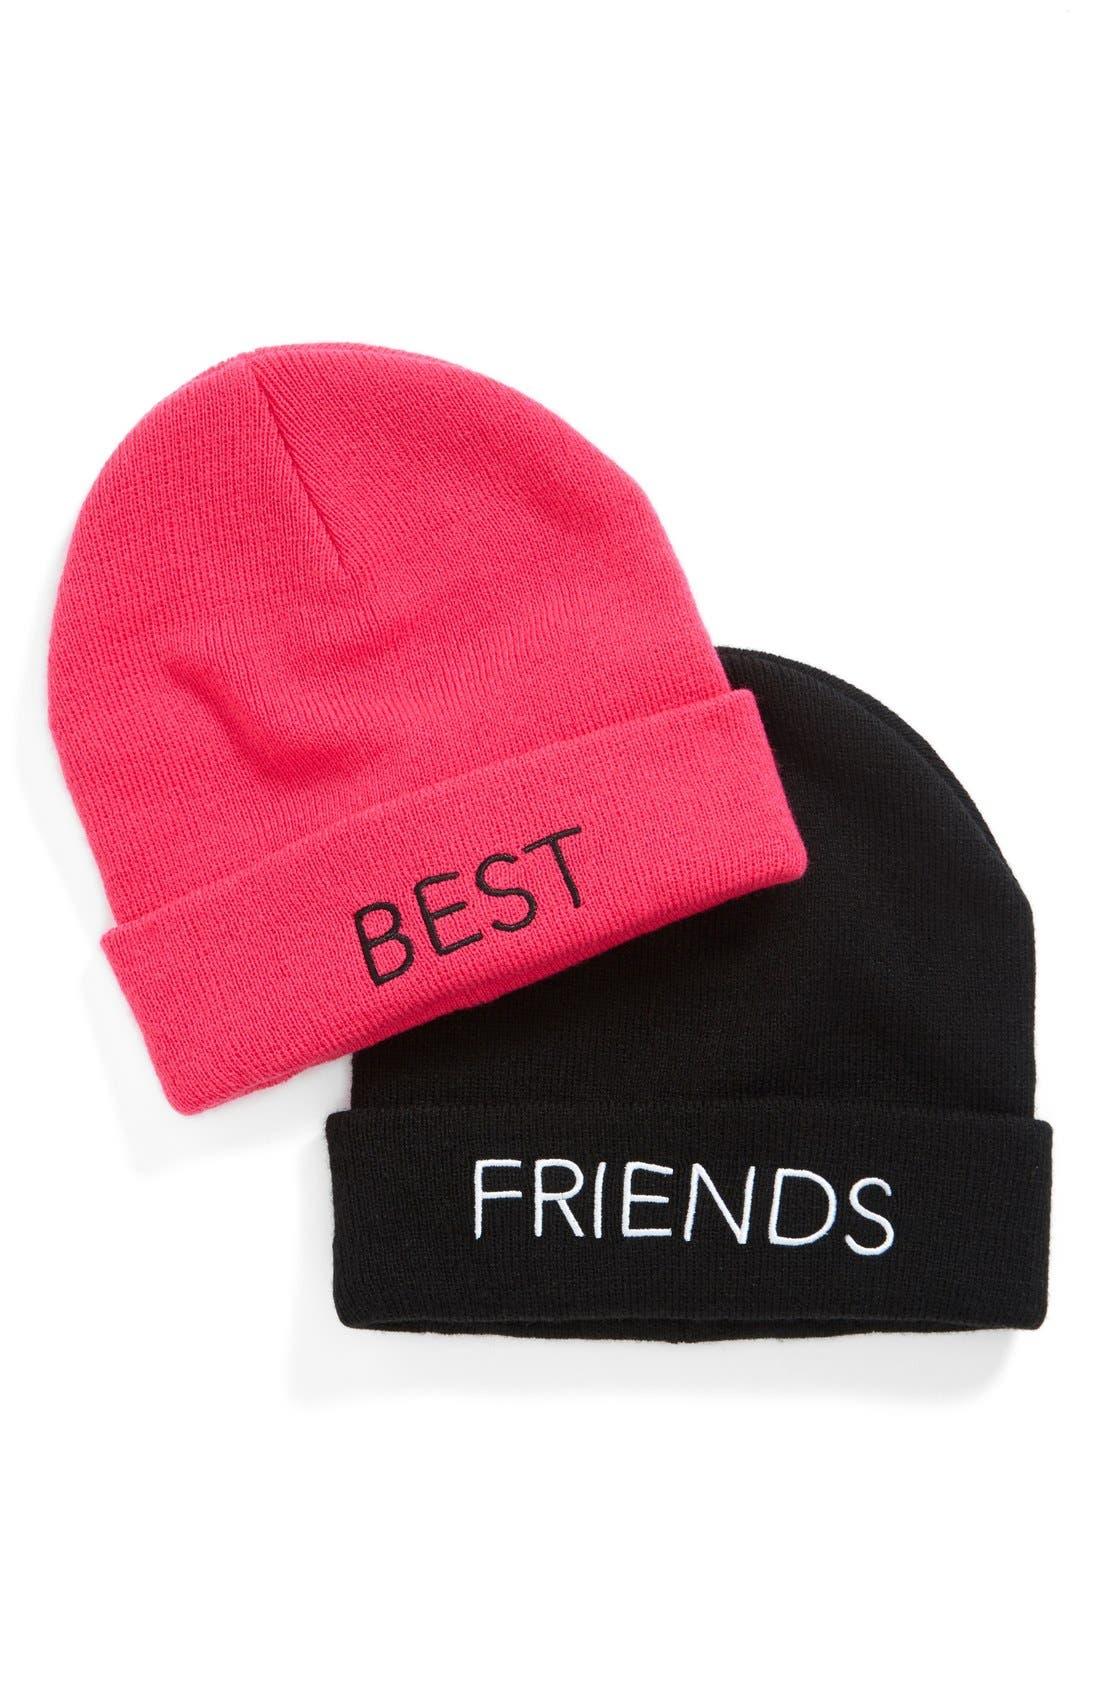 'Bestie' Beanie Set,                         Main,                         color, Black/ Pink